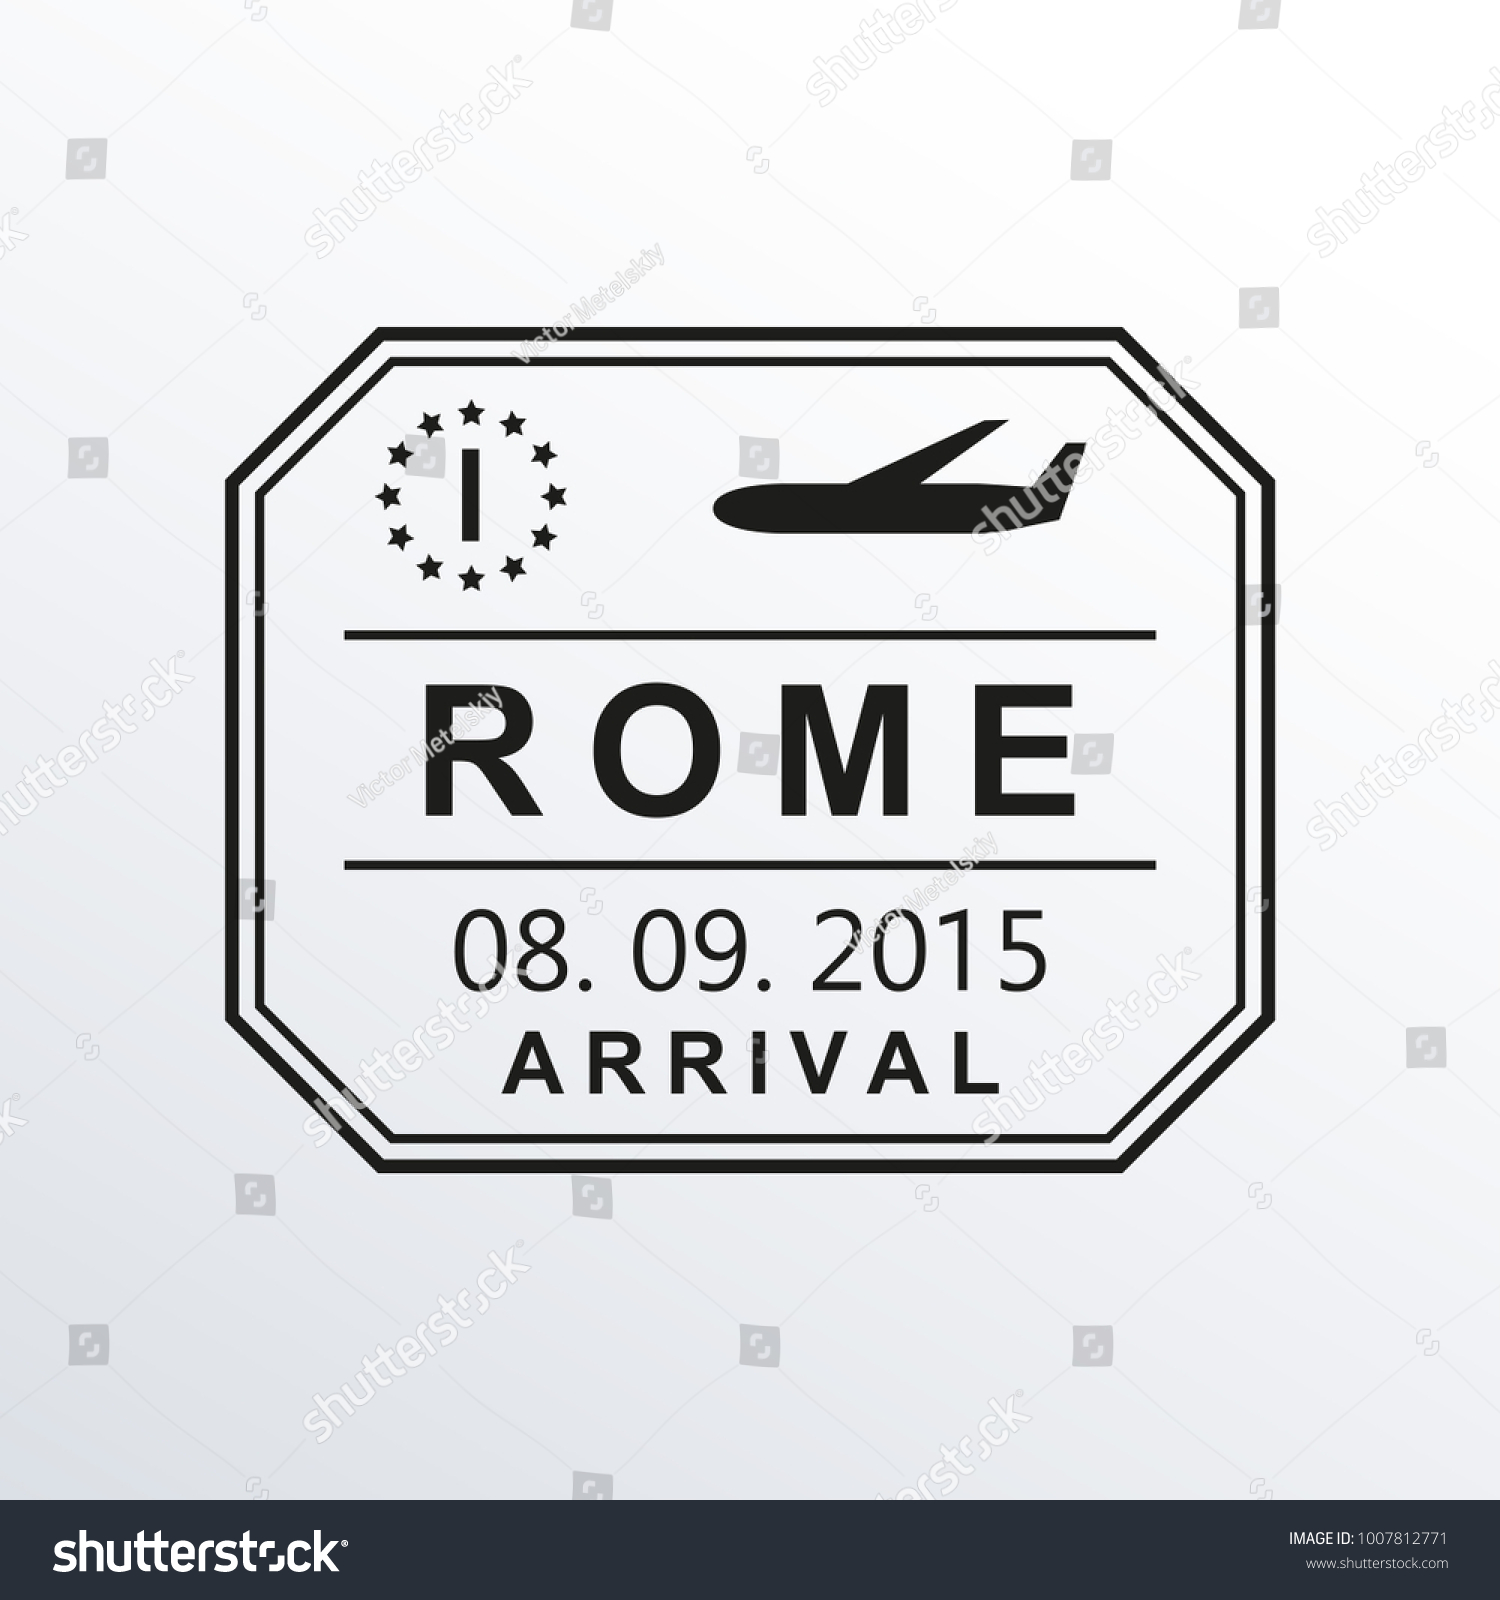 Rome passport stamp italy airport visa stock vector 1007812771 italy airport visa stamp or immigration sign custom control cachet biocorpaavc Choice Image